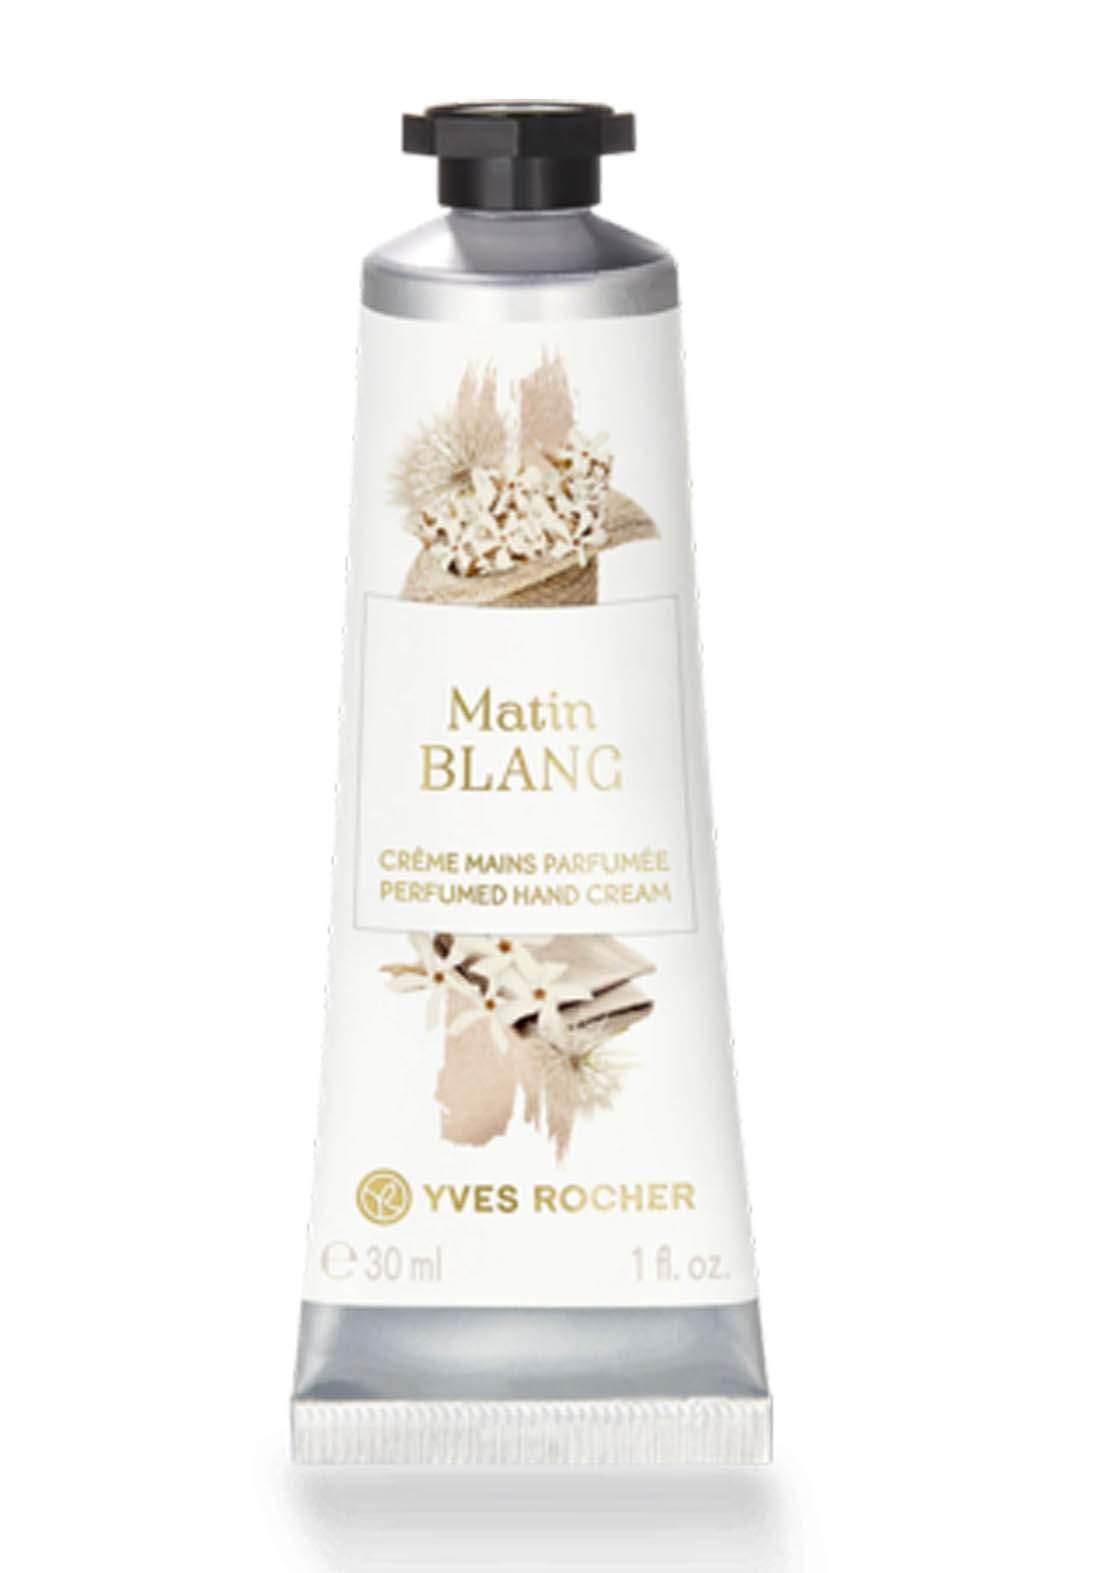 Yves Rocher 61511 Matin Blanc Perfumed Hand Cream -كريم اليد